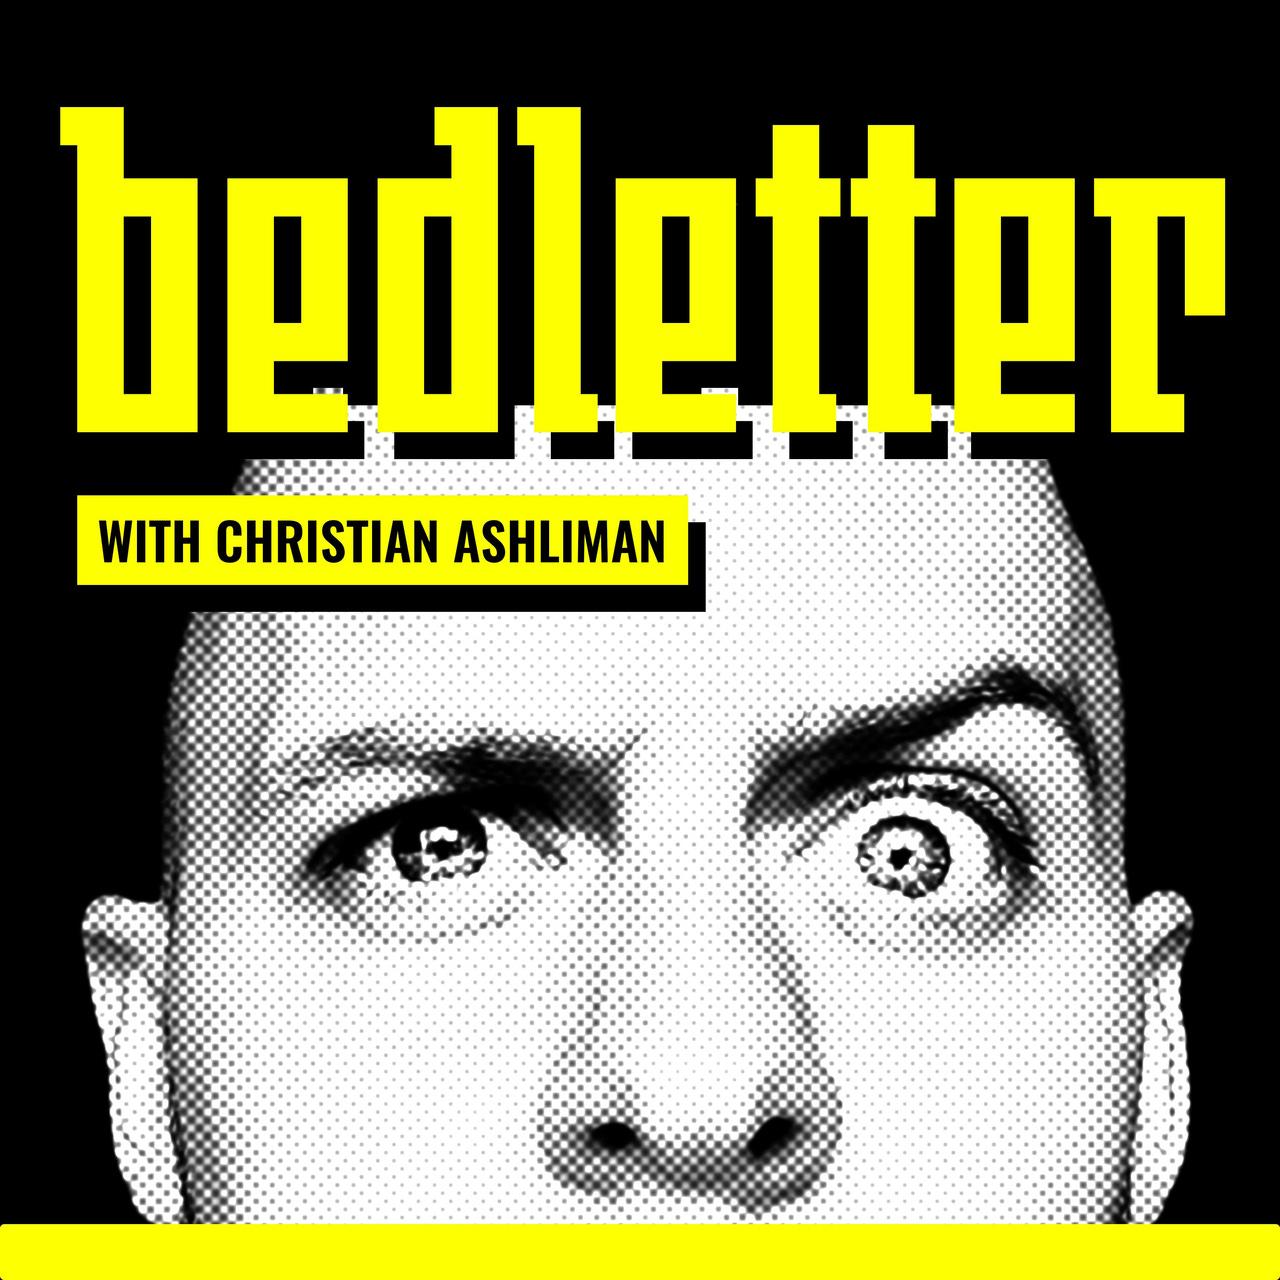 Bedletter with Christian Ashliman